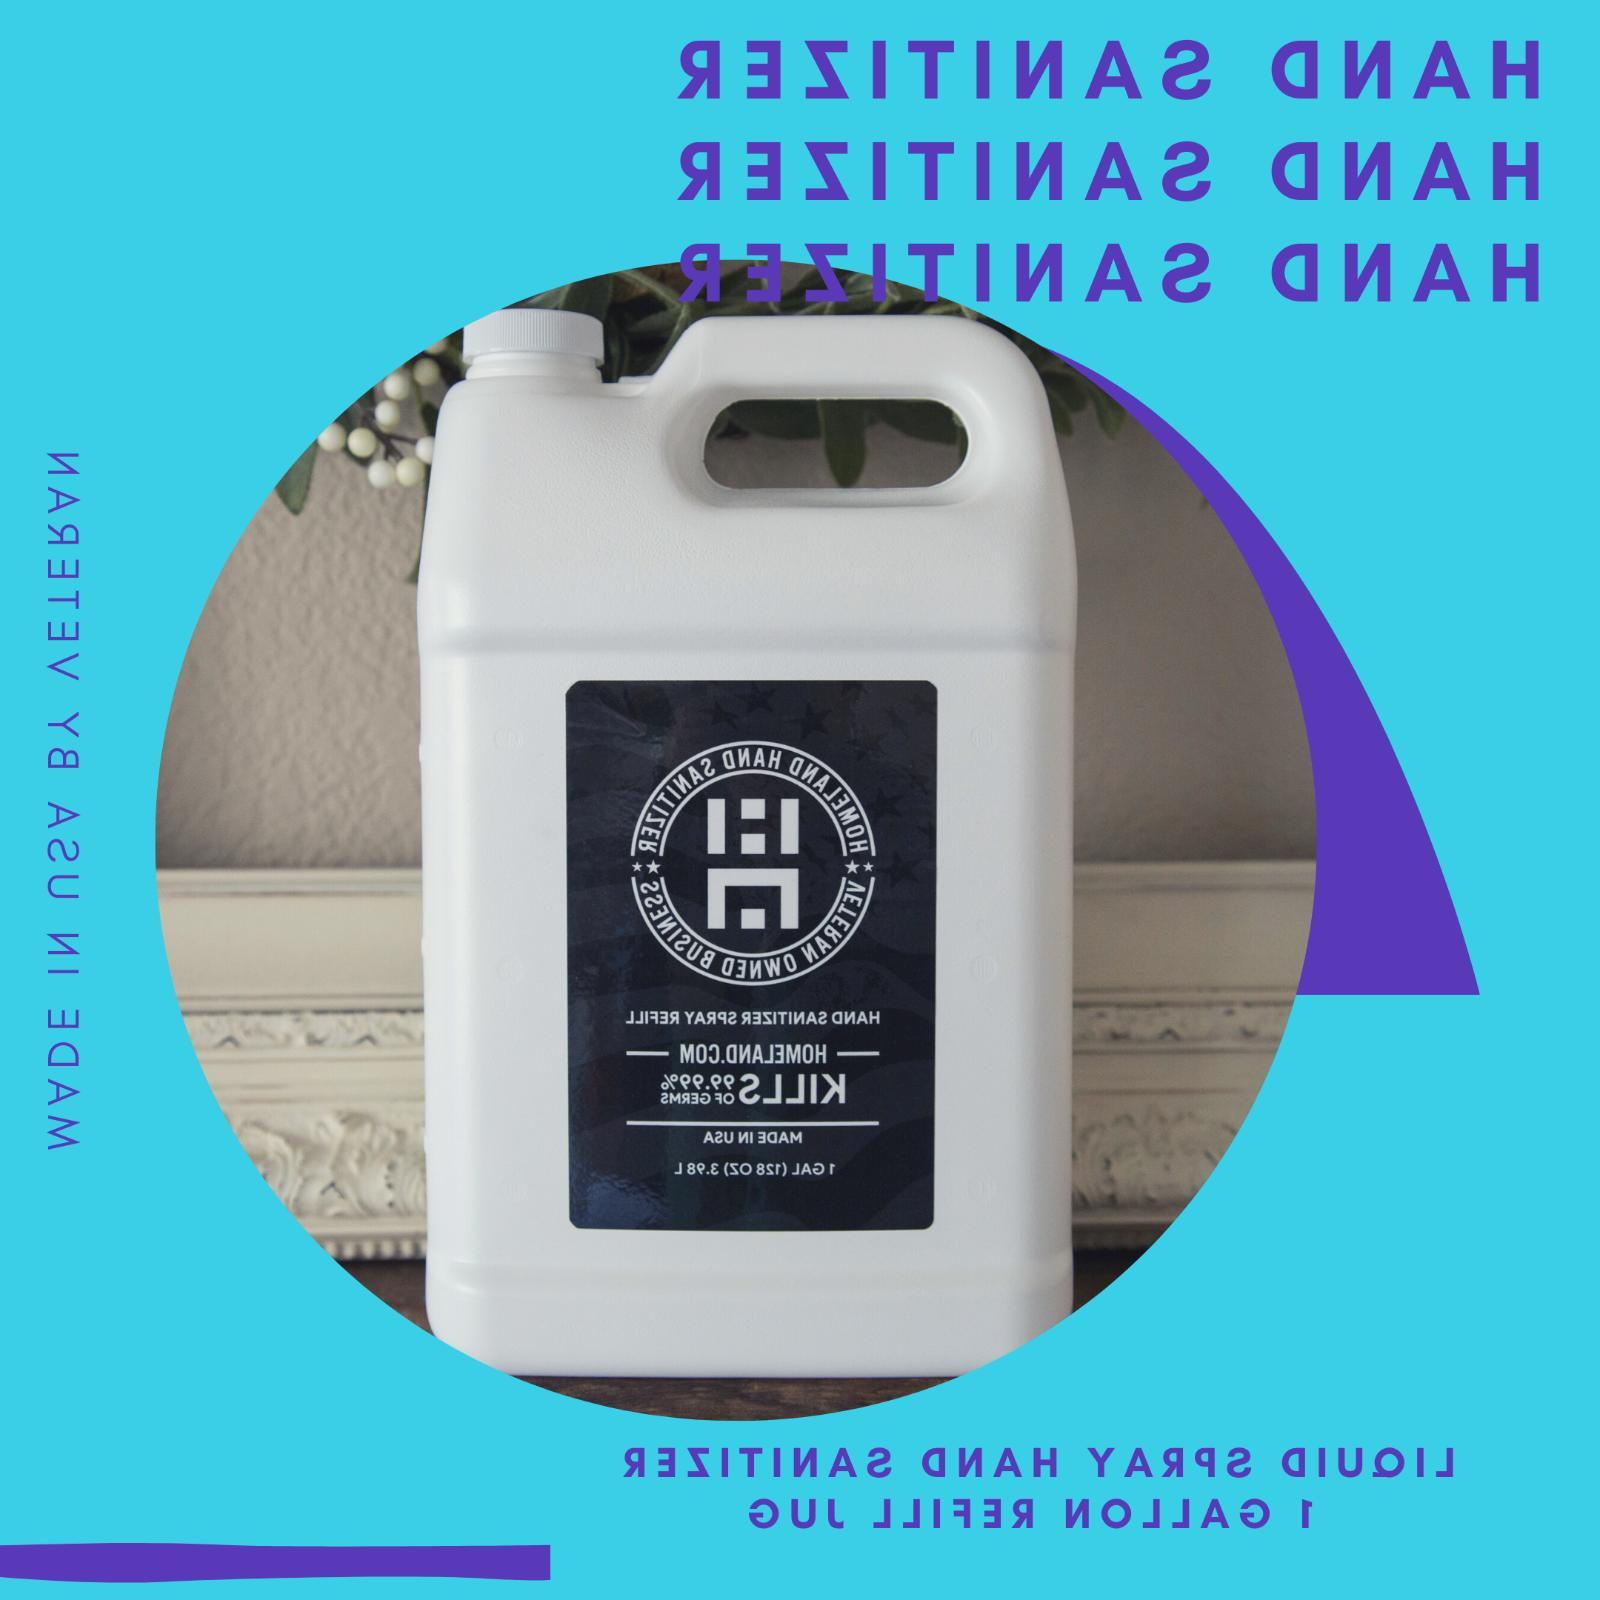 hand sanitizer liquid 1 gallon refill kills